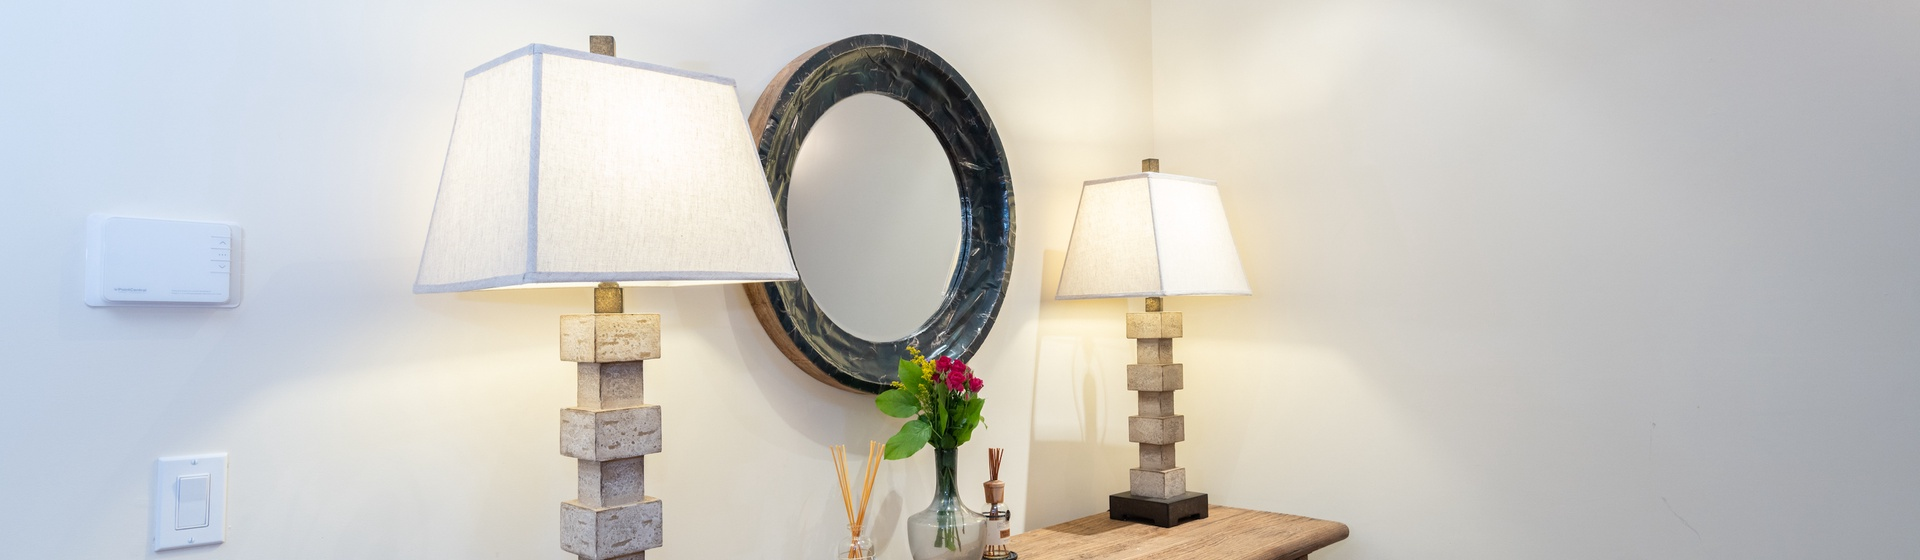 6.5-Telluride-Pine-Street-Penthouse-A-Hallway-detail